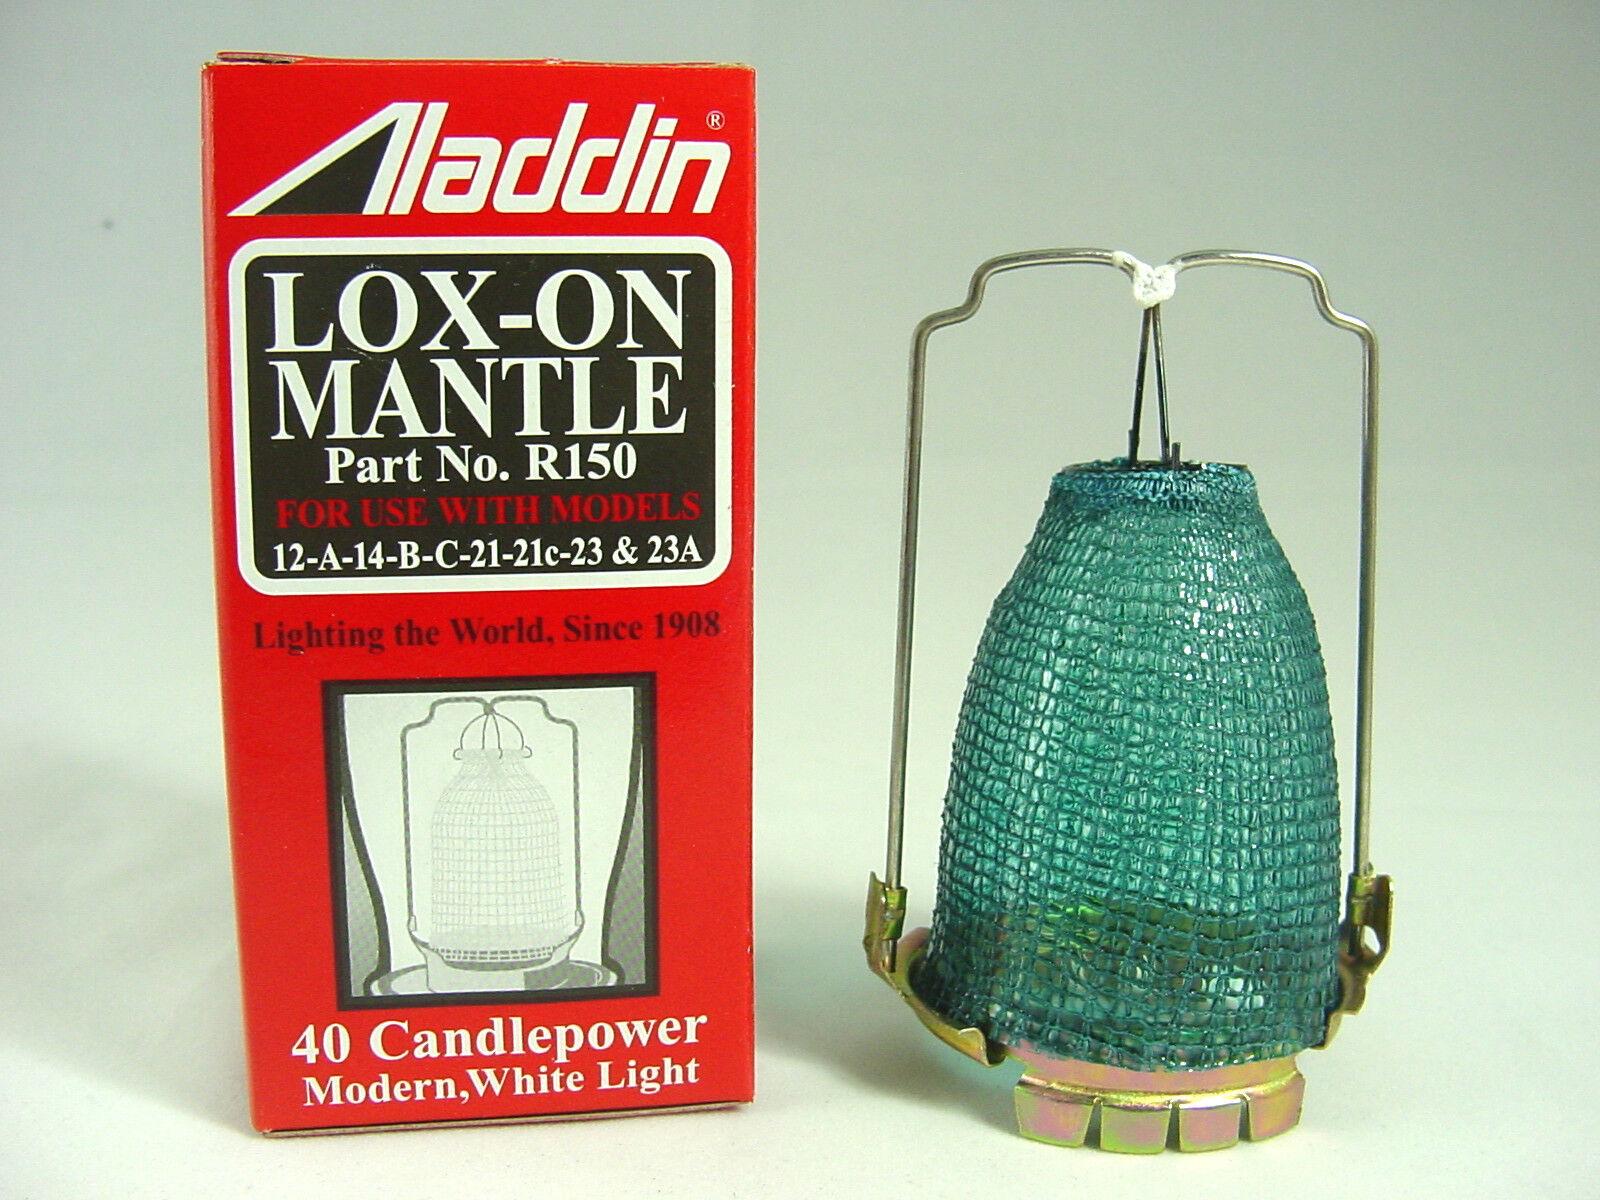 Aladdin R-150 Lox-on Oil Lamp Mantle | eBay